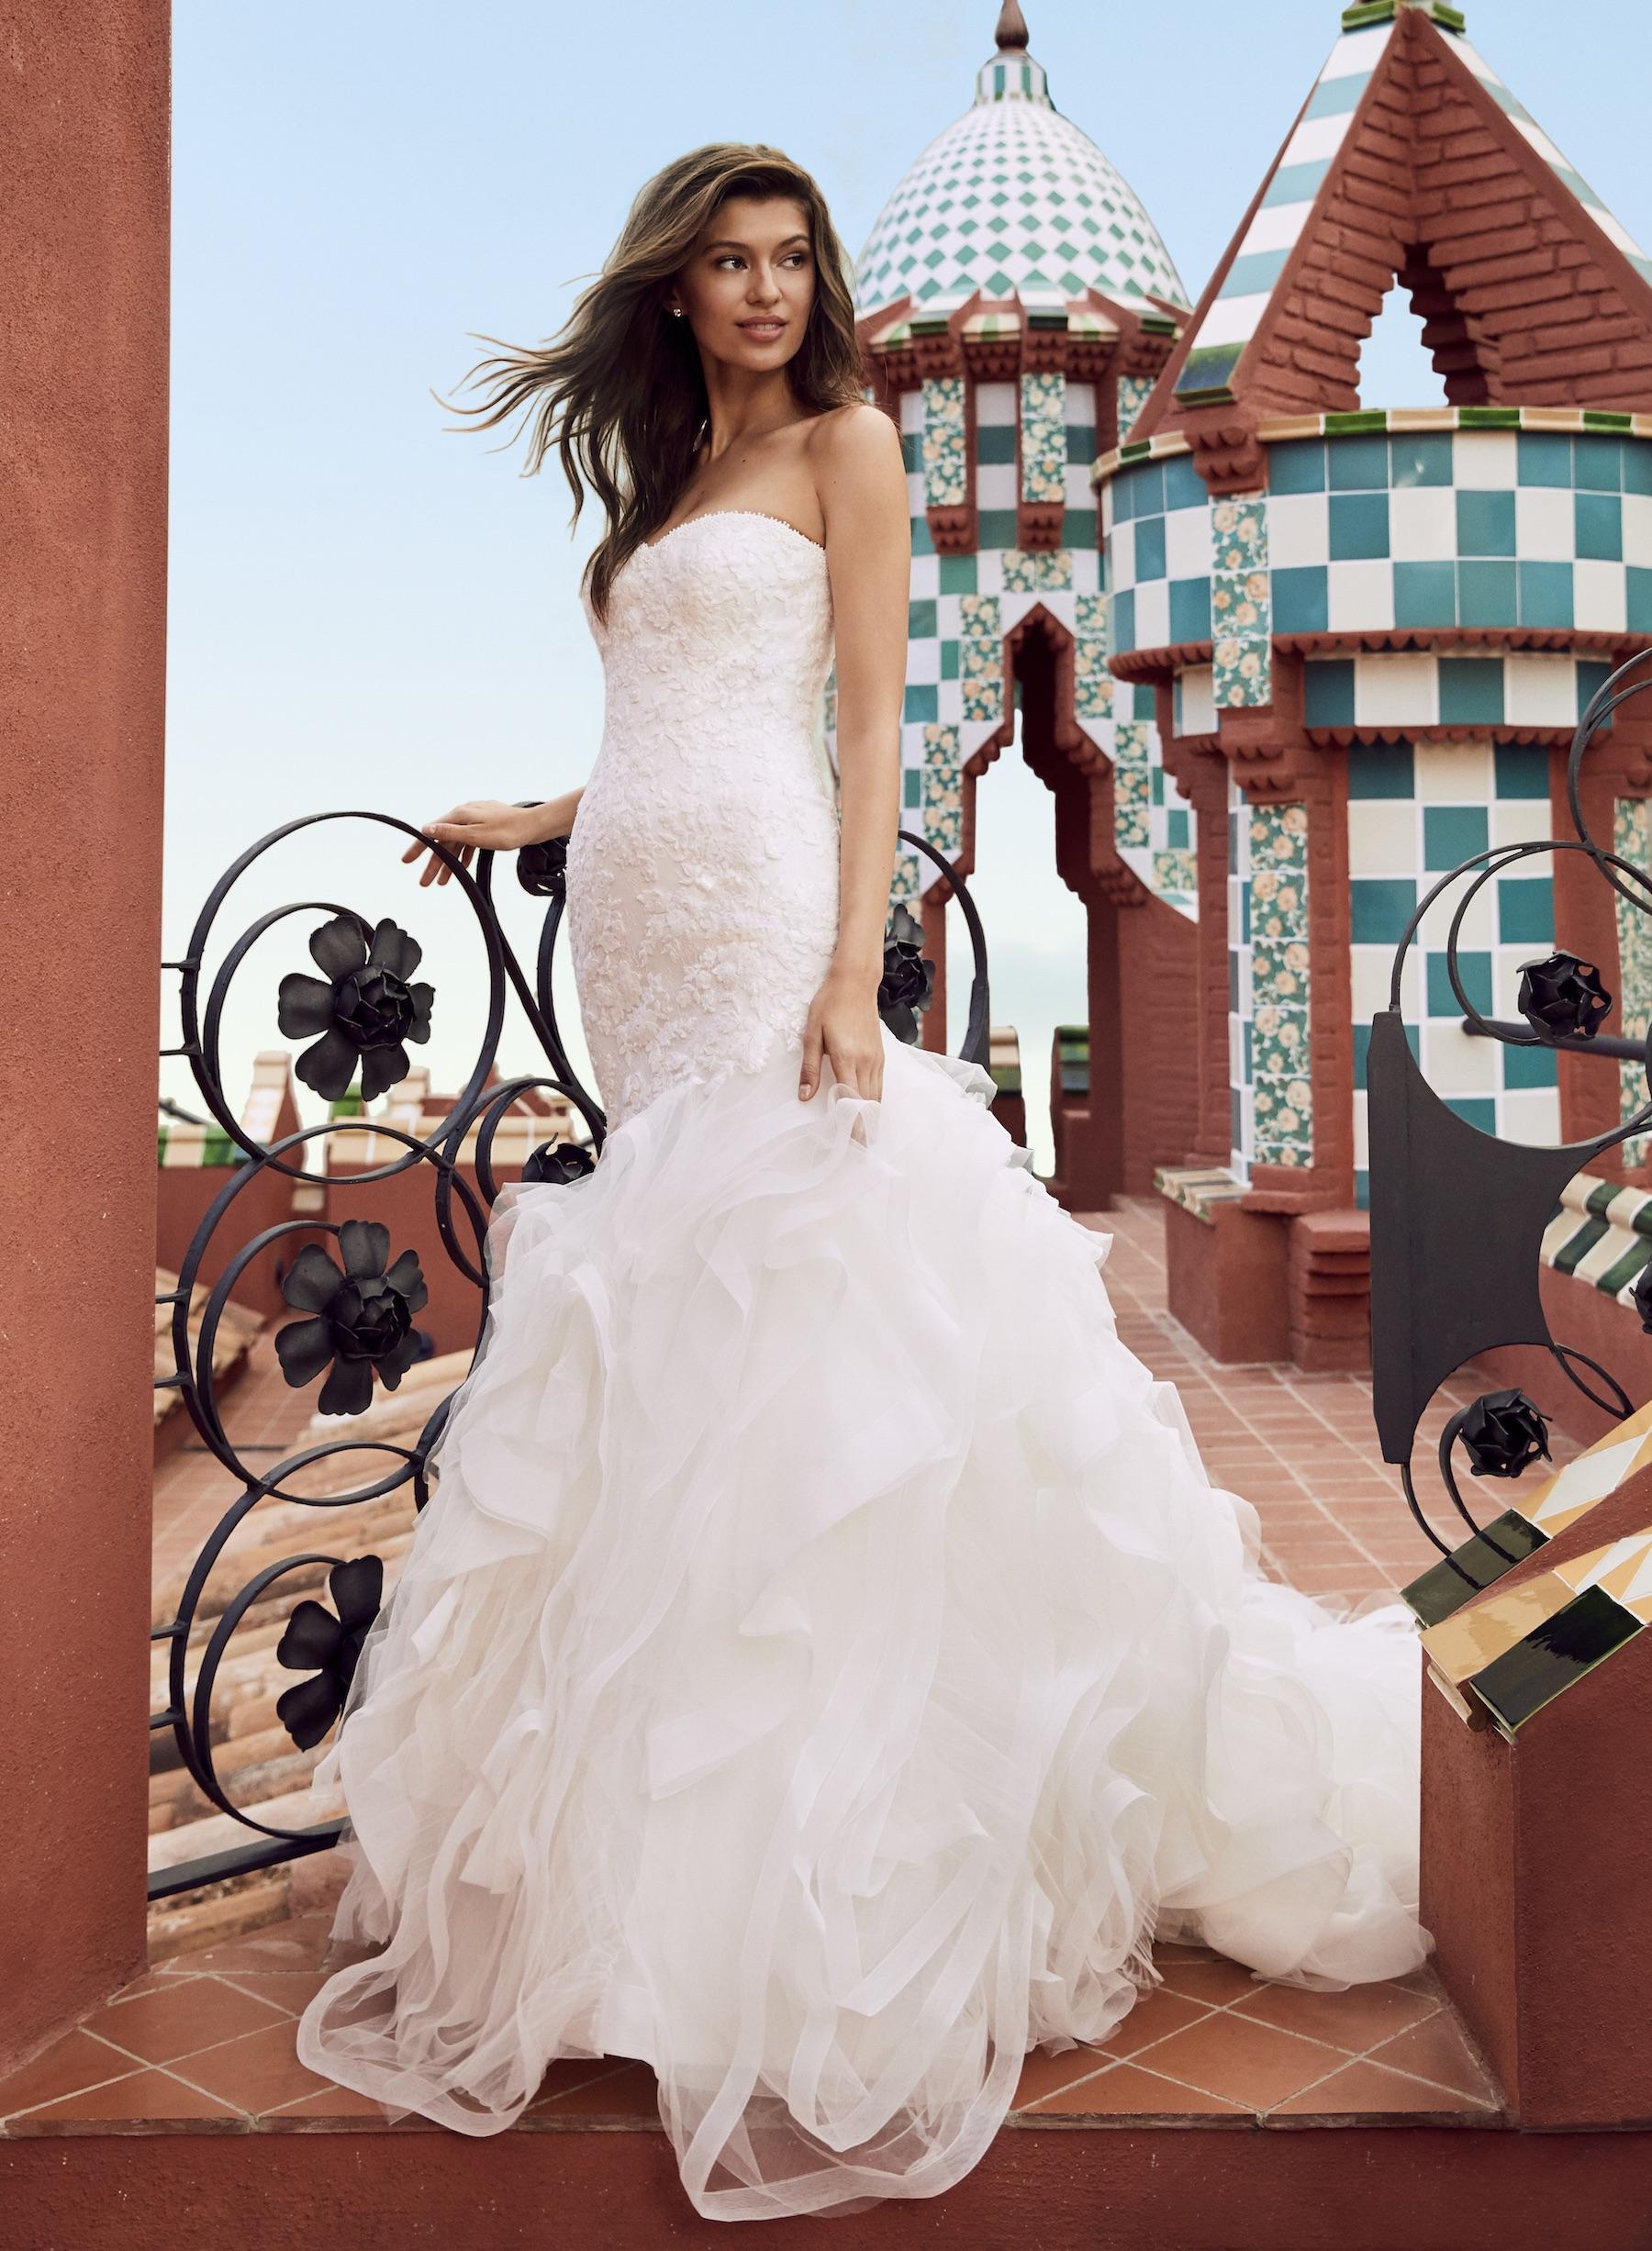 Sweetheart Strapless Lace Bodice Mermaid Wedding Dress